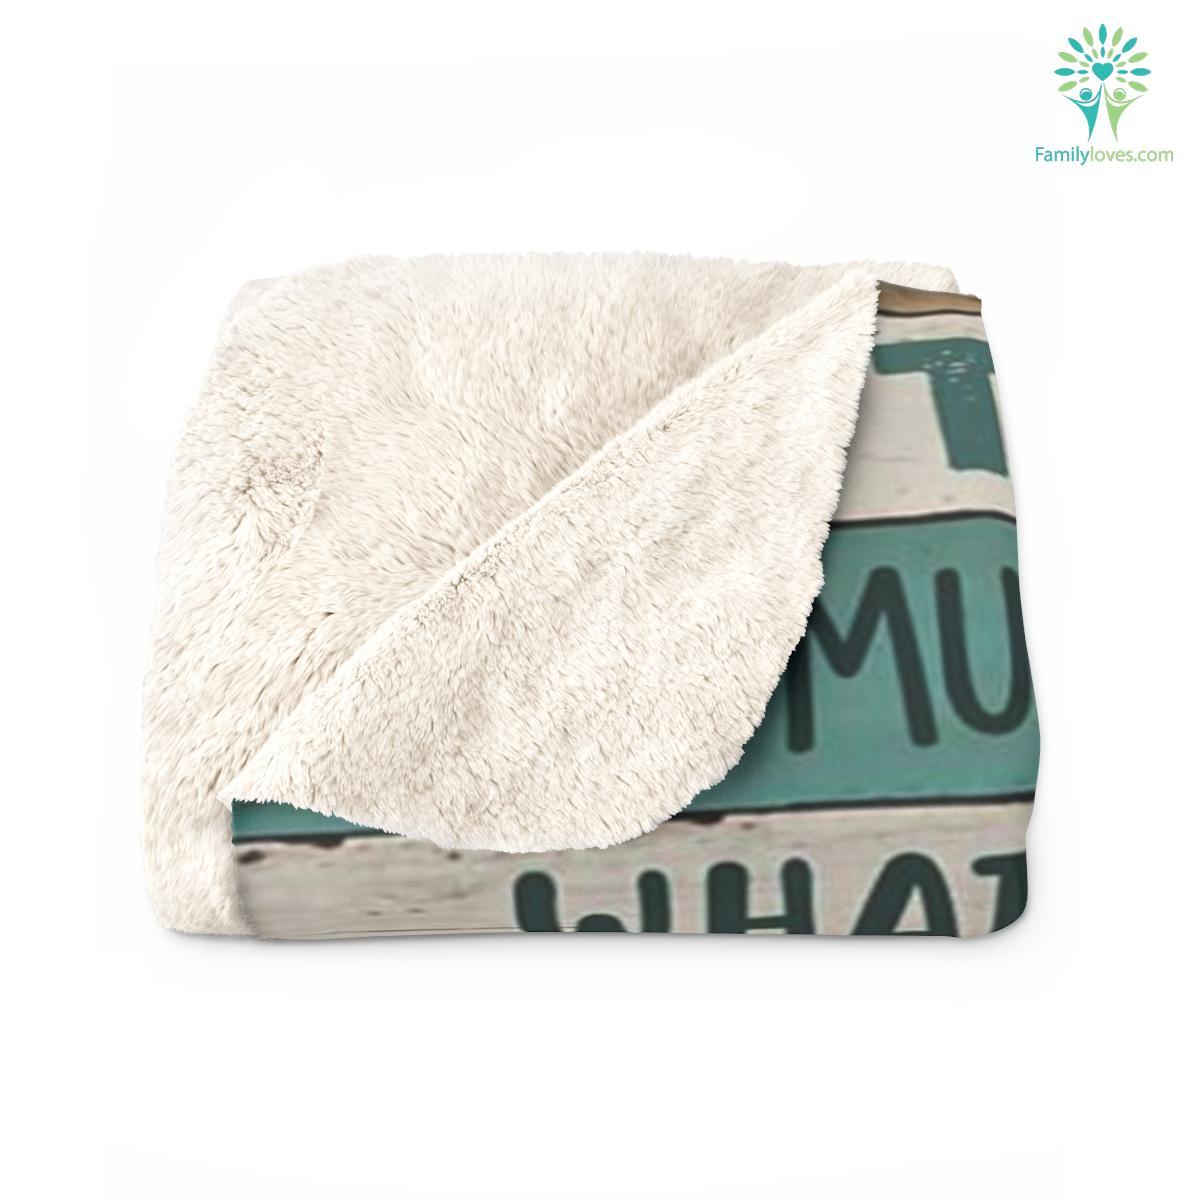 To My Dad Sherpa Fleece Blanket Familyloves.com